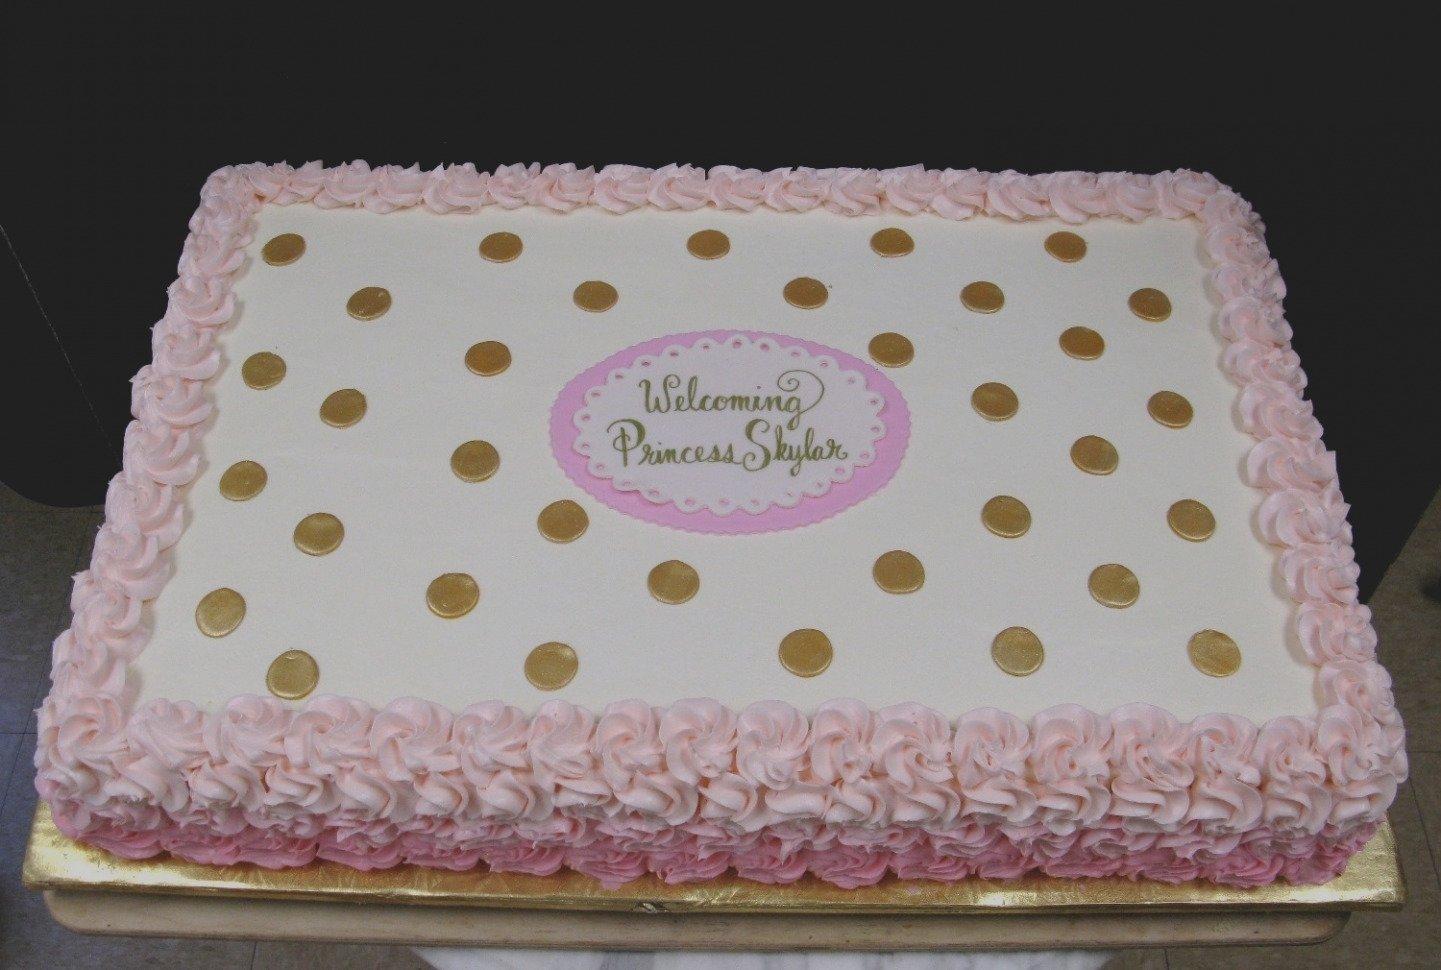 10 Nice Baby Shower Sheet Cake Ideas beautiful of baby shower sheet cake ideas cakes for girls ruffles 2021